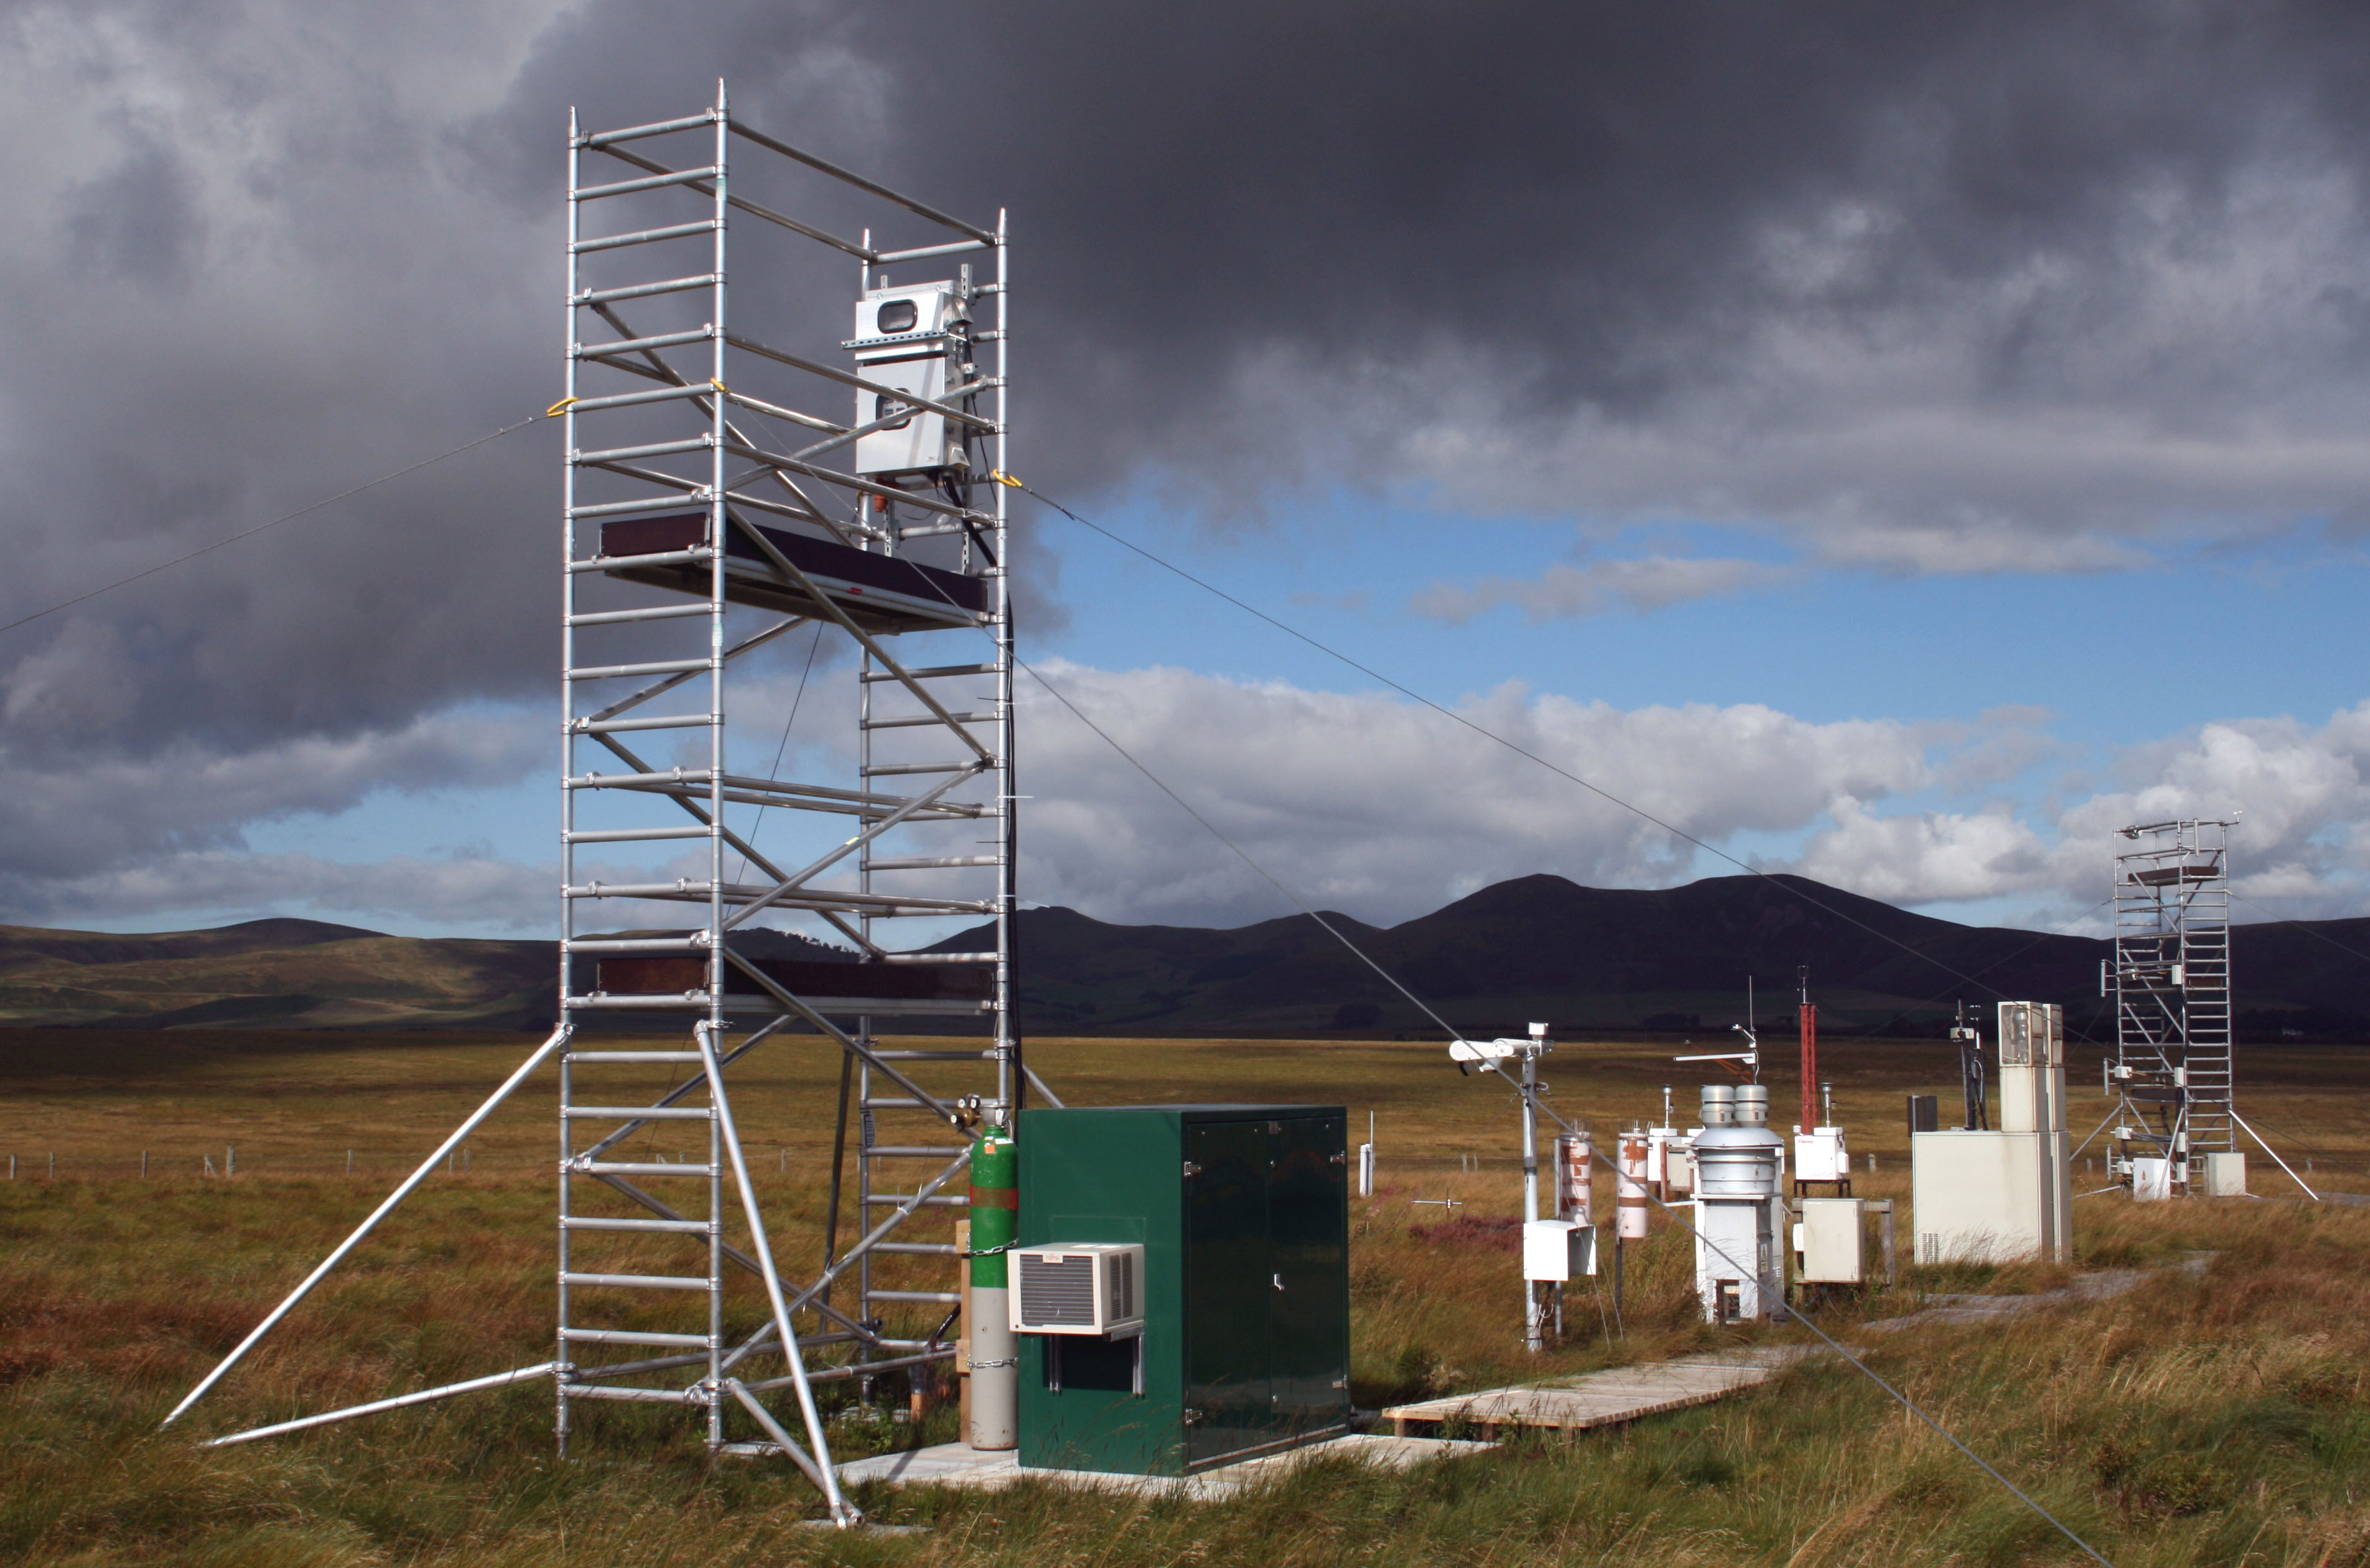 Auchencorth monitoring site, Scotland (Photo: Ian Leith, UKCEH)